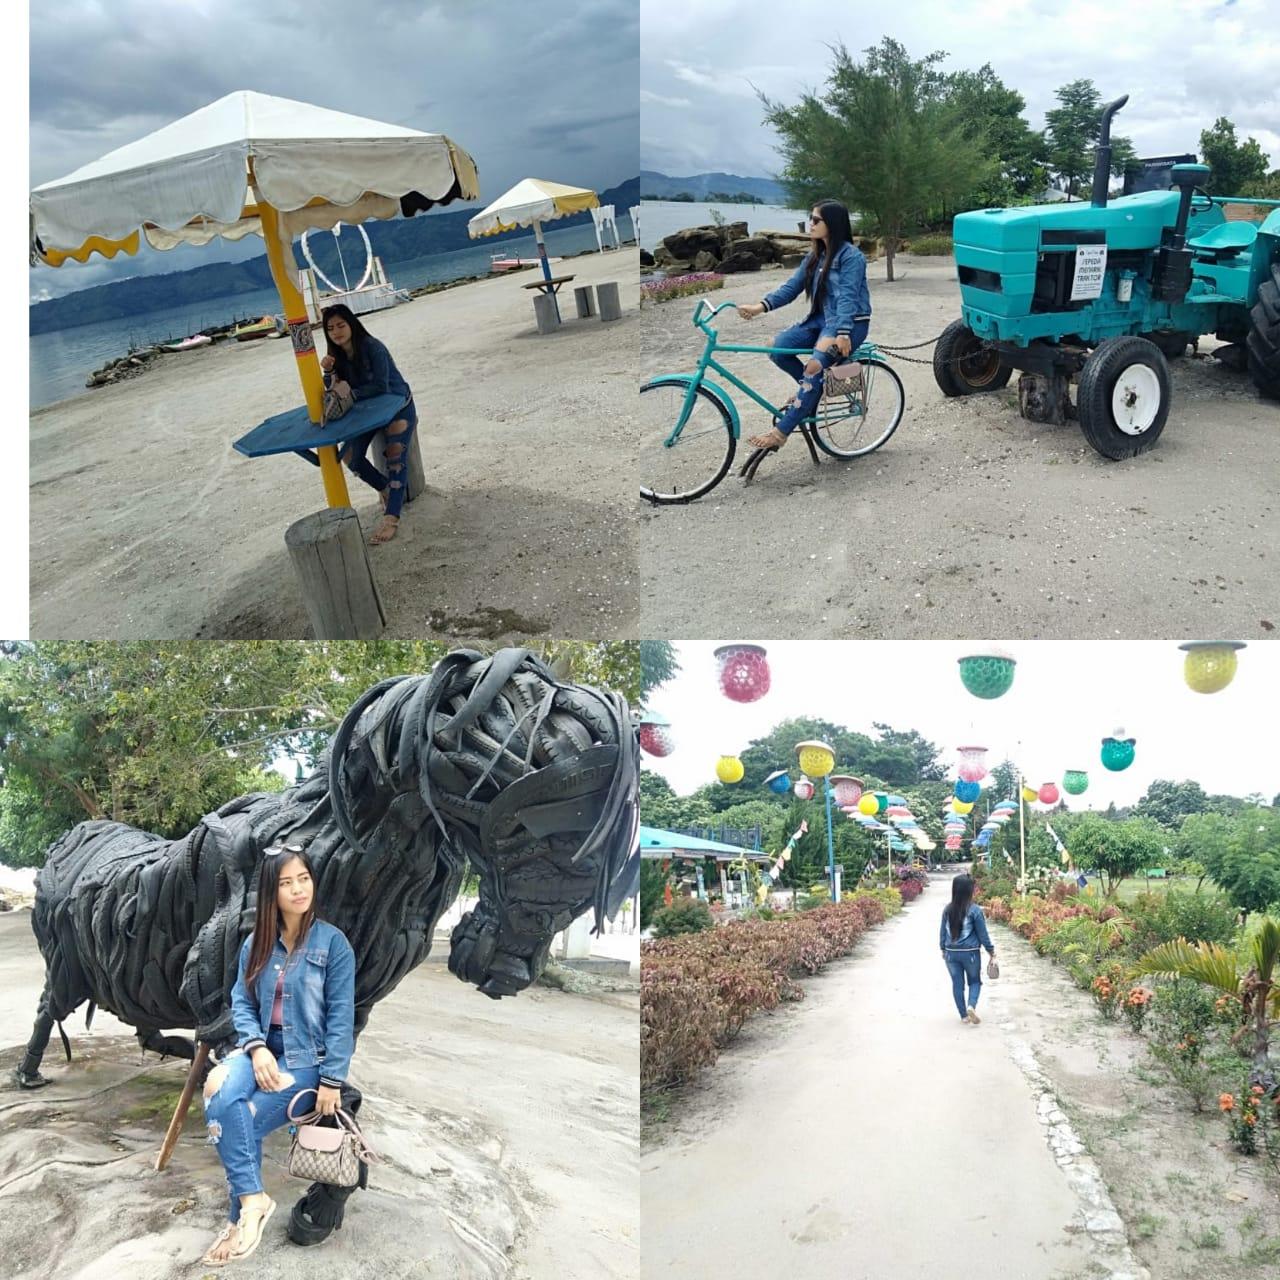 Foto : Pengunjung suka suka berselfie ria di Objek Wisata Unggulan Pantai Pasir Putih  'BATUHODA BEACH' Pulau Samosir